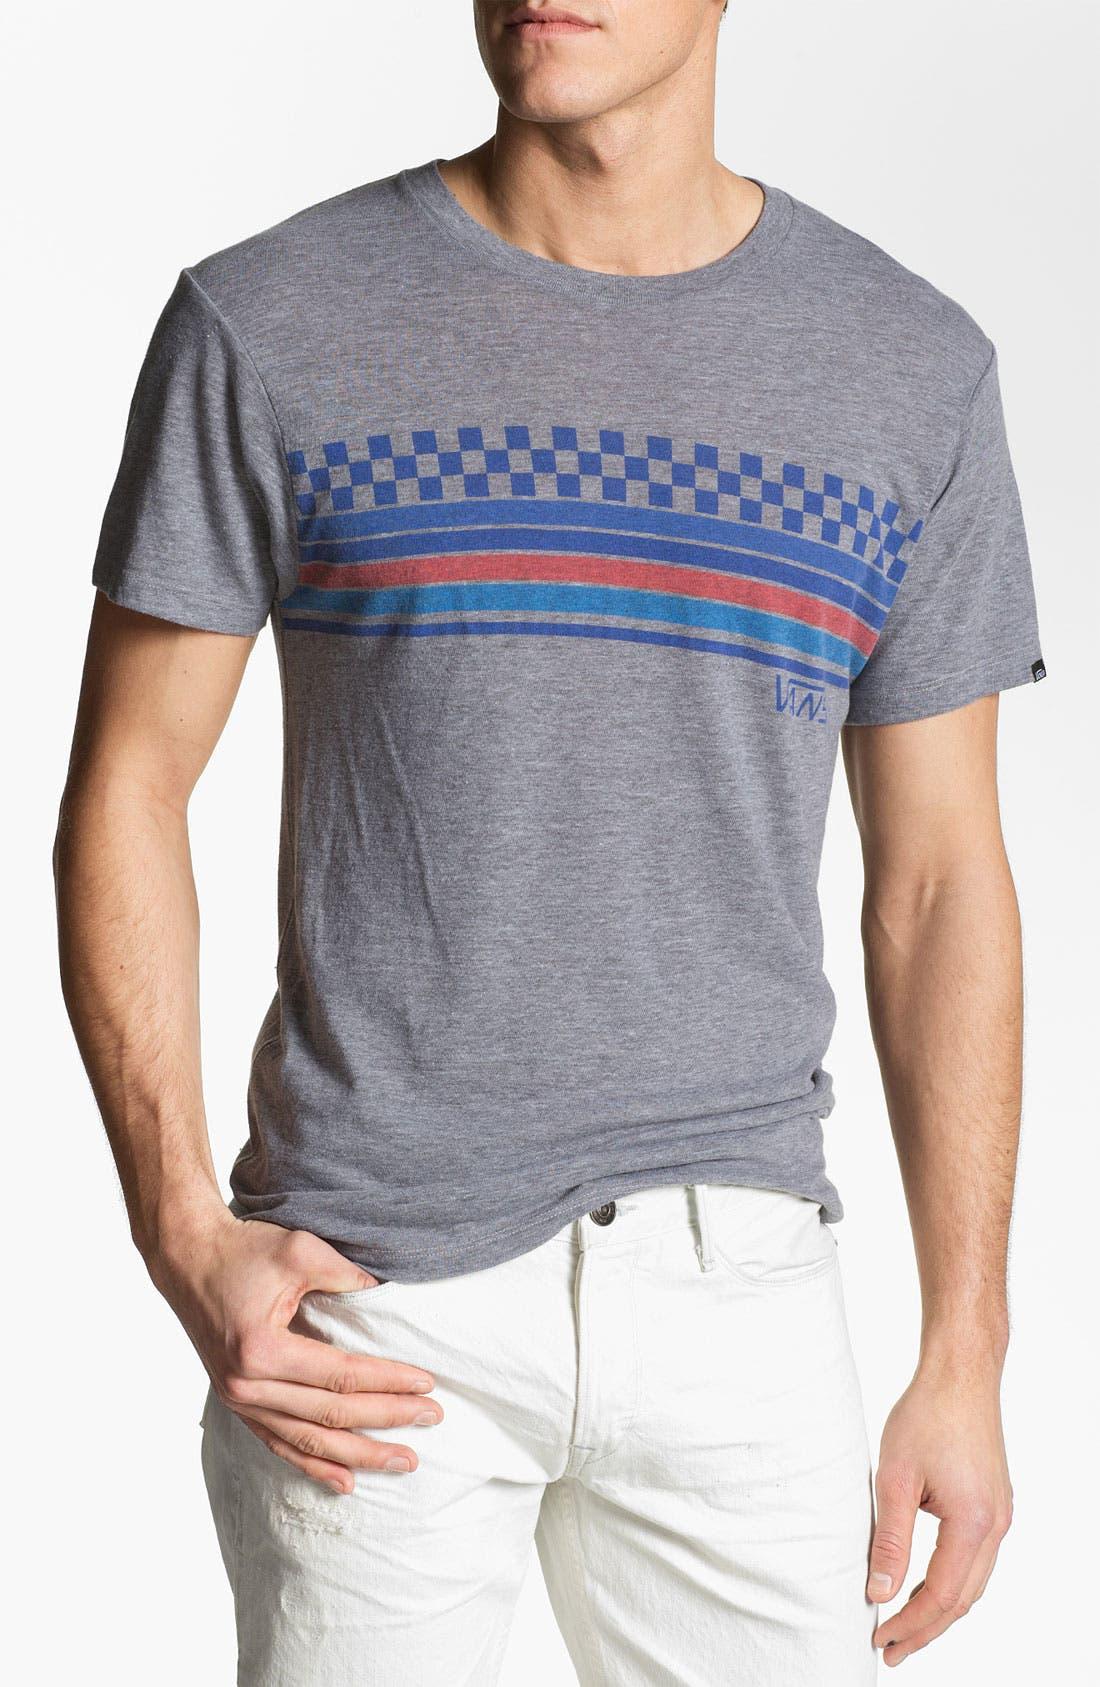 Alternate Image 1 Selected - Vans 'Pista' T-Shirt